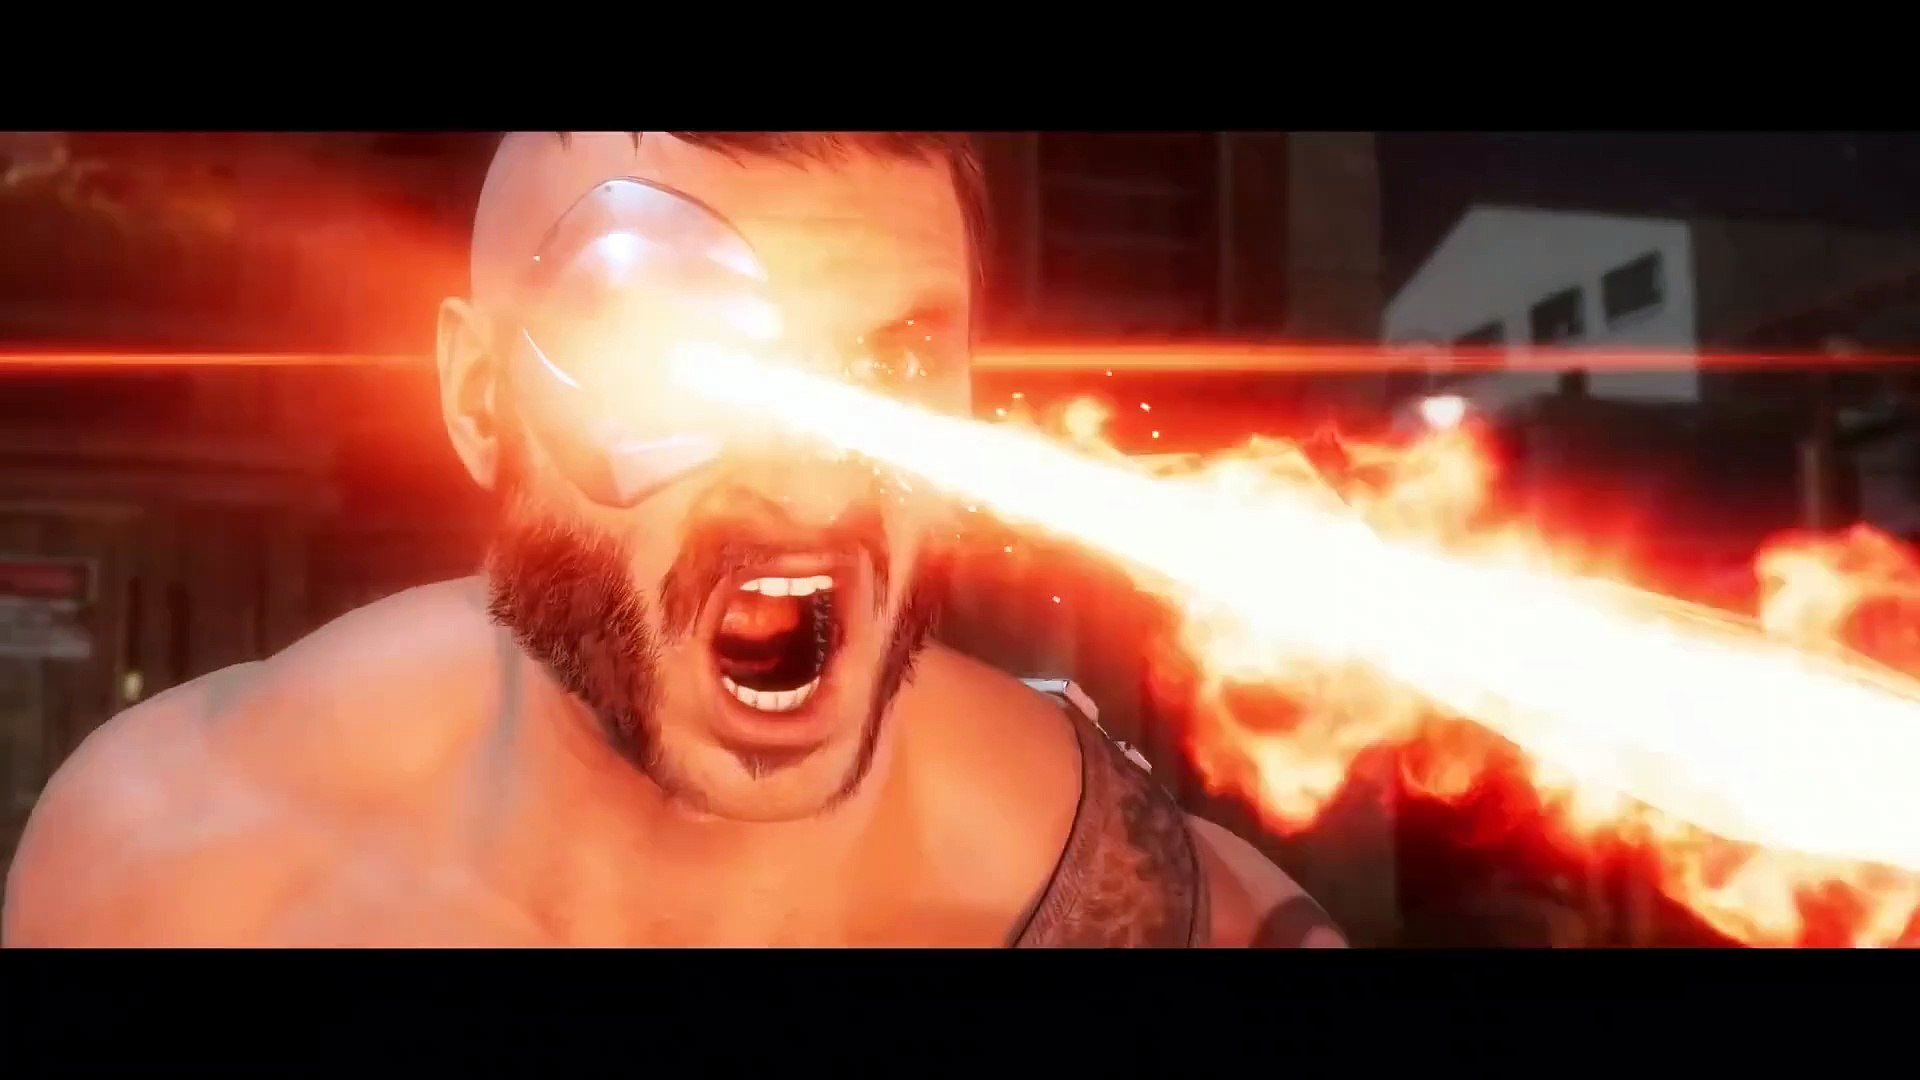 Mortal Kombat 11 | Launch Trailer (2019)